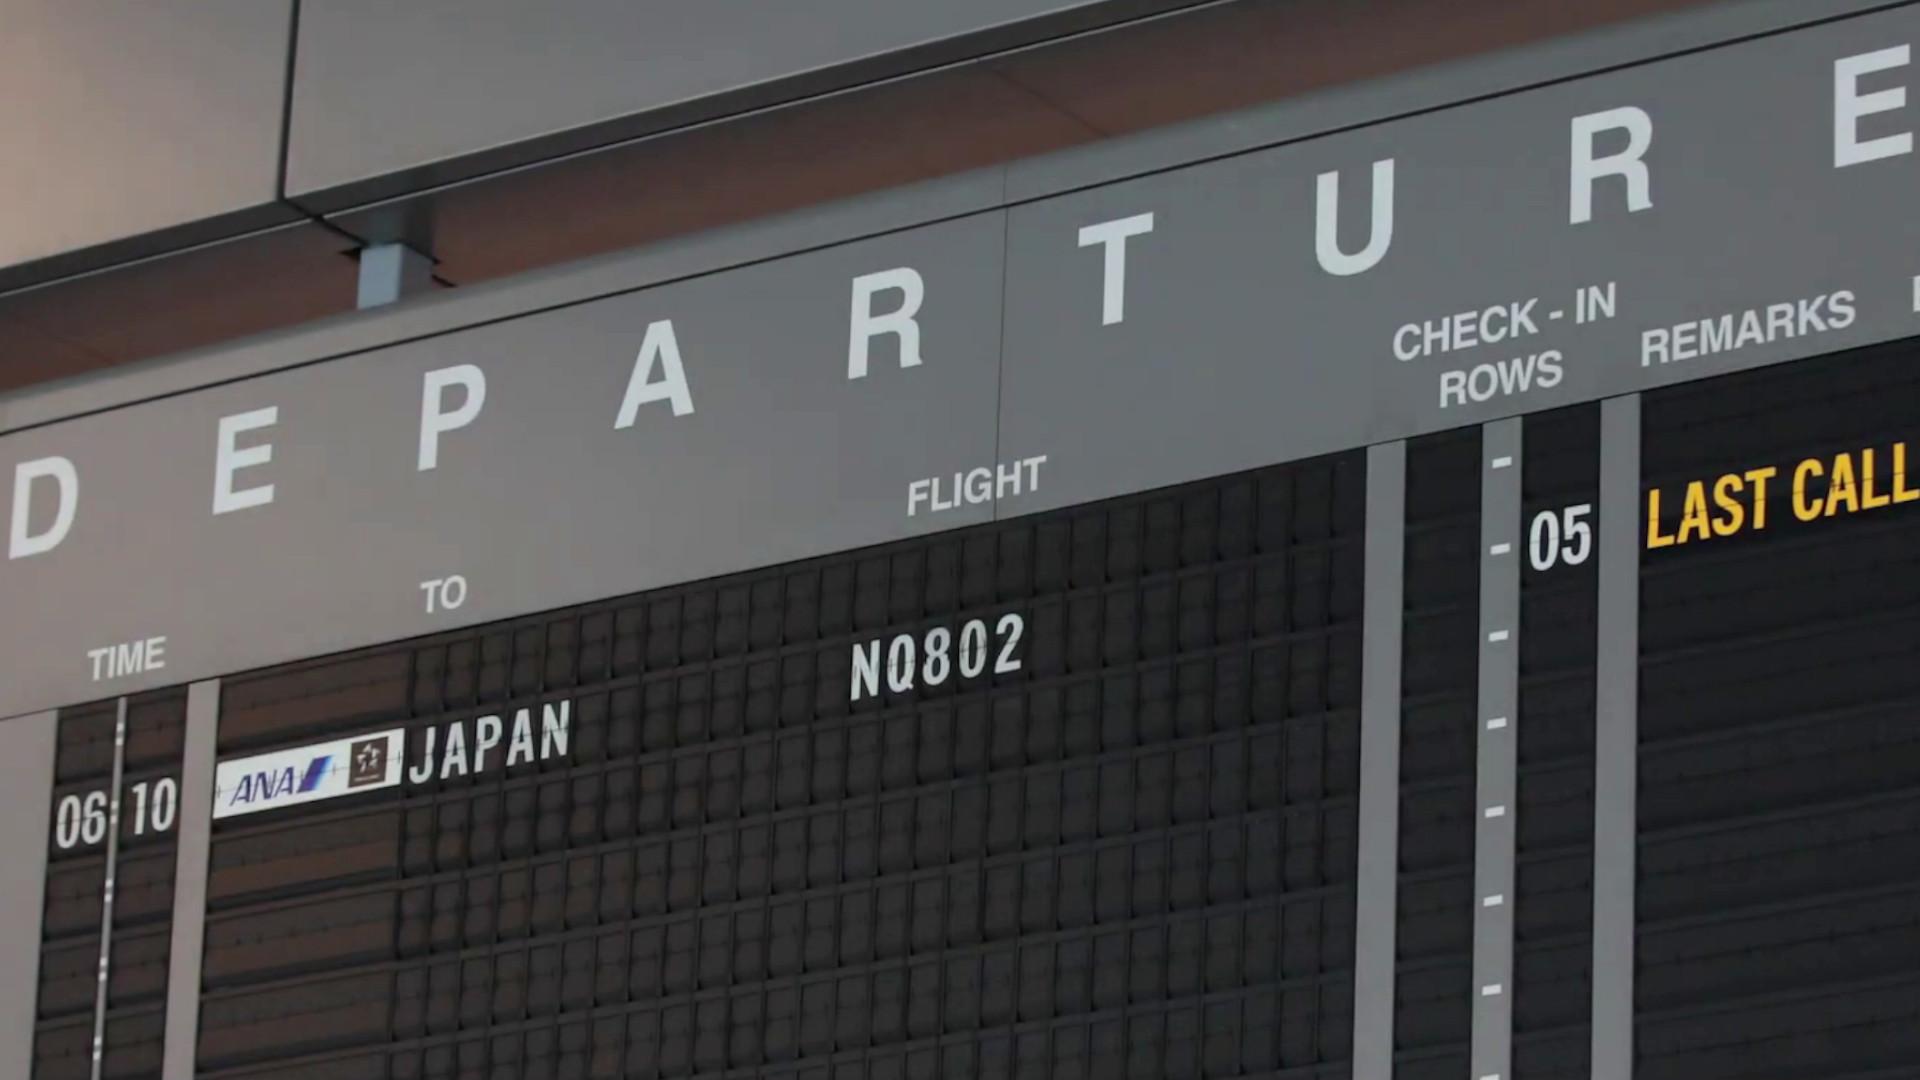 Departure Flight Board, T2 Changi Airport of Singapore